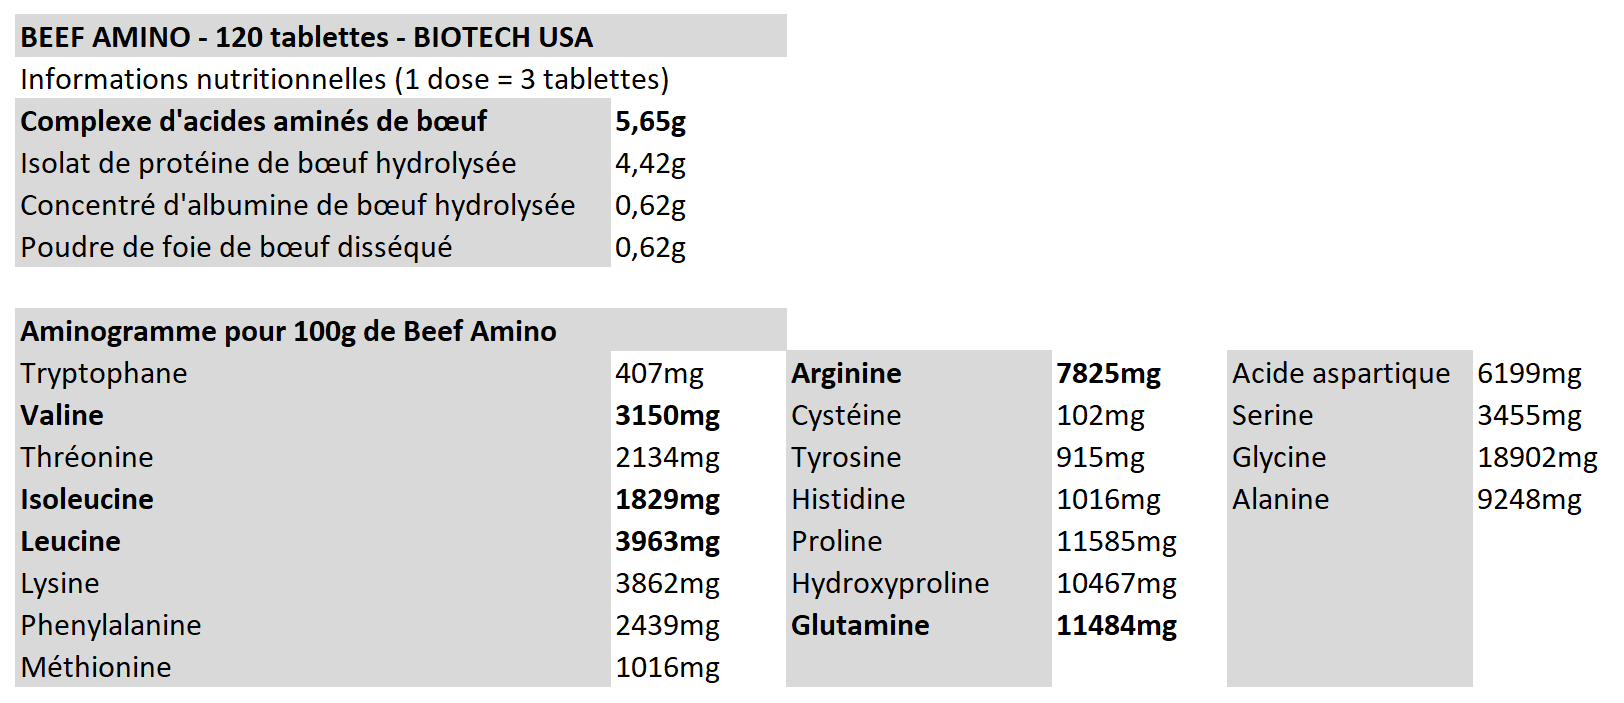 Beef Amino - Biotech USA